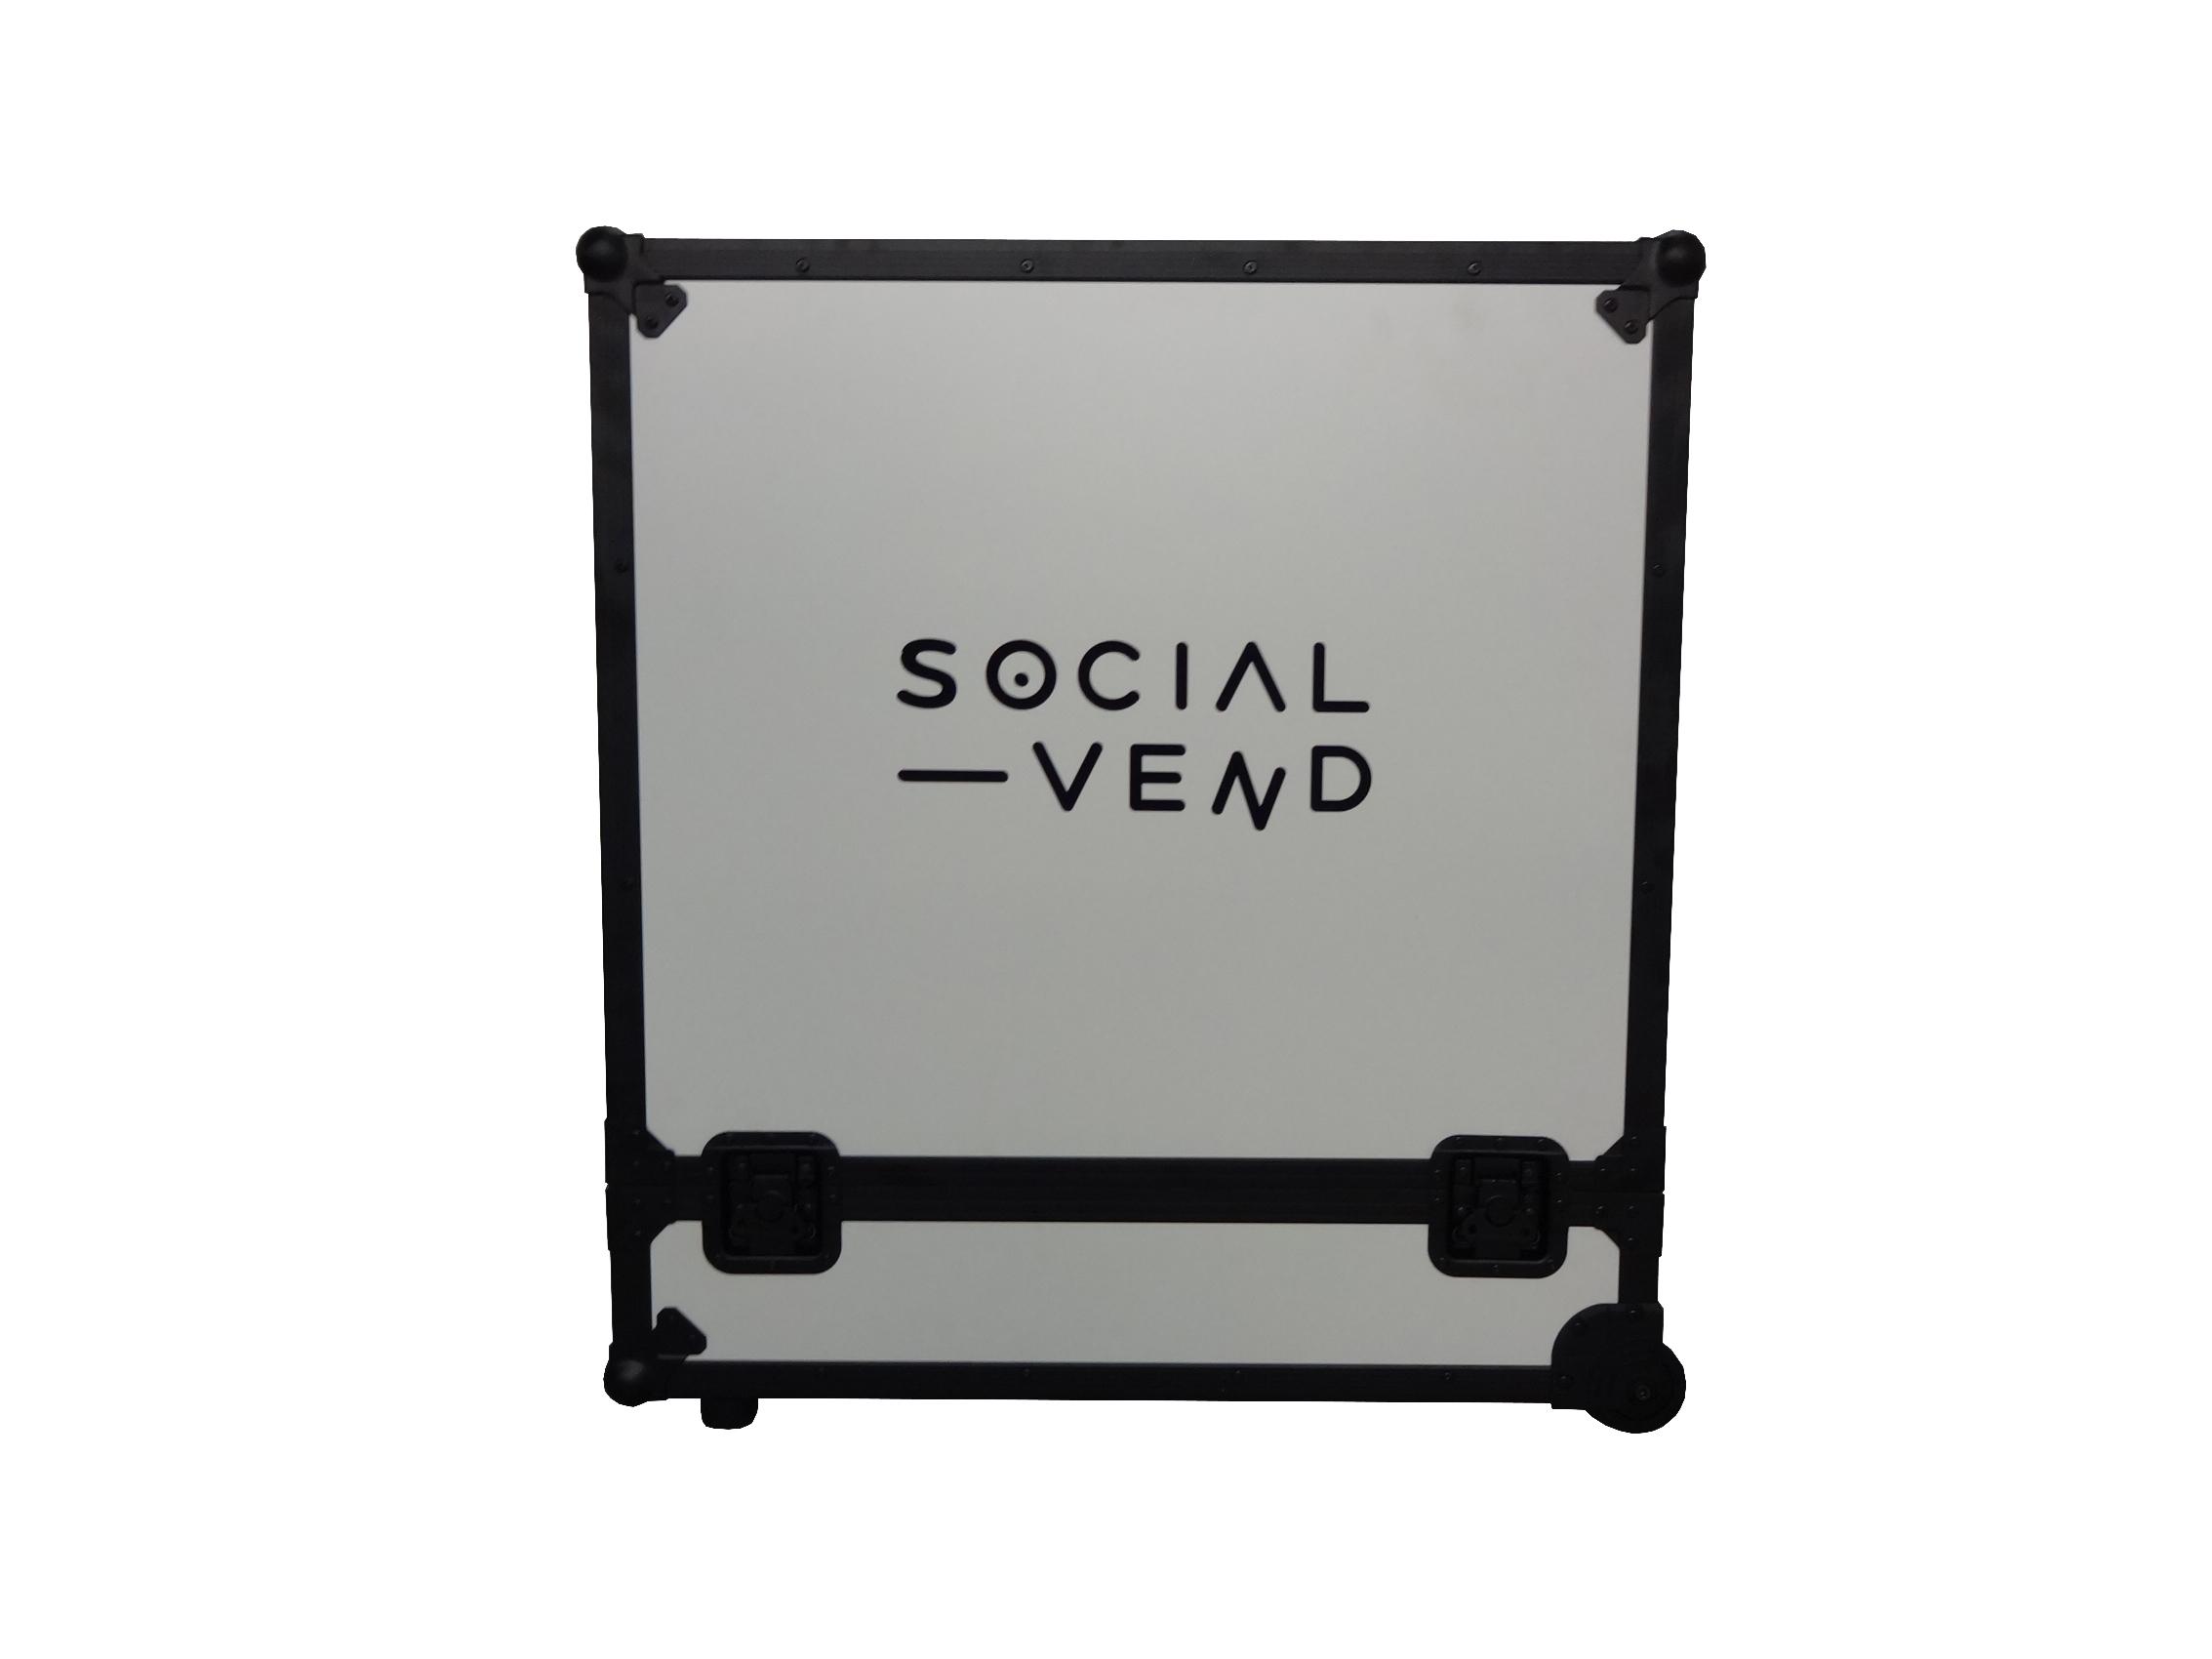 Social Vend